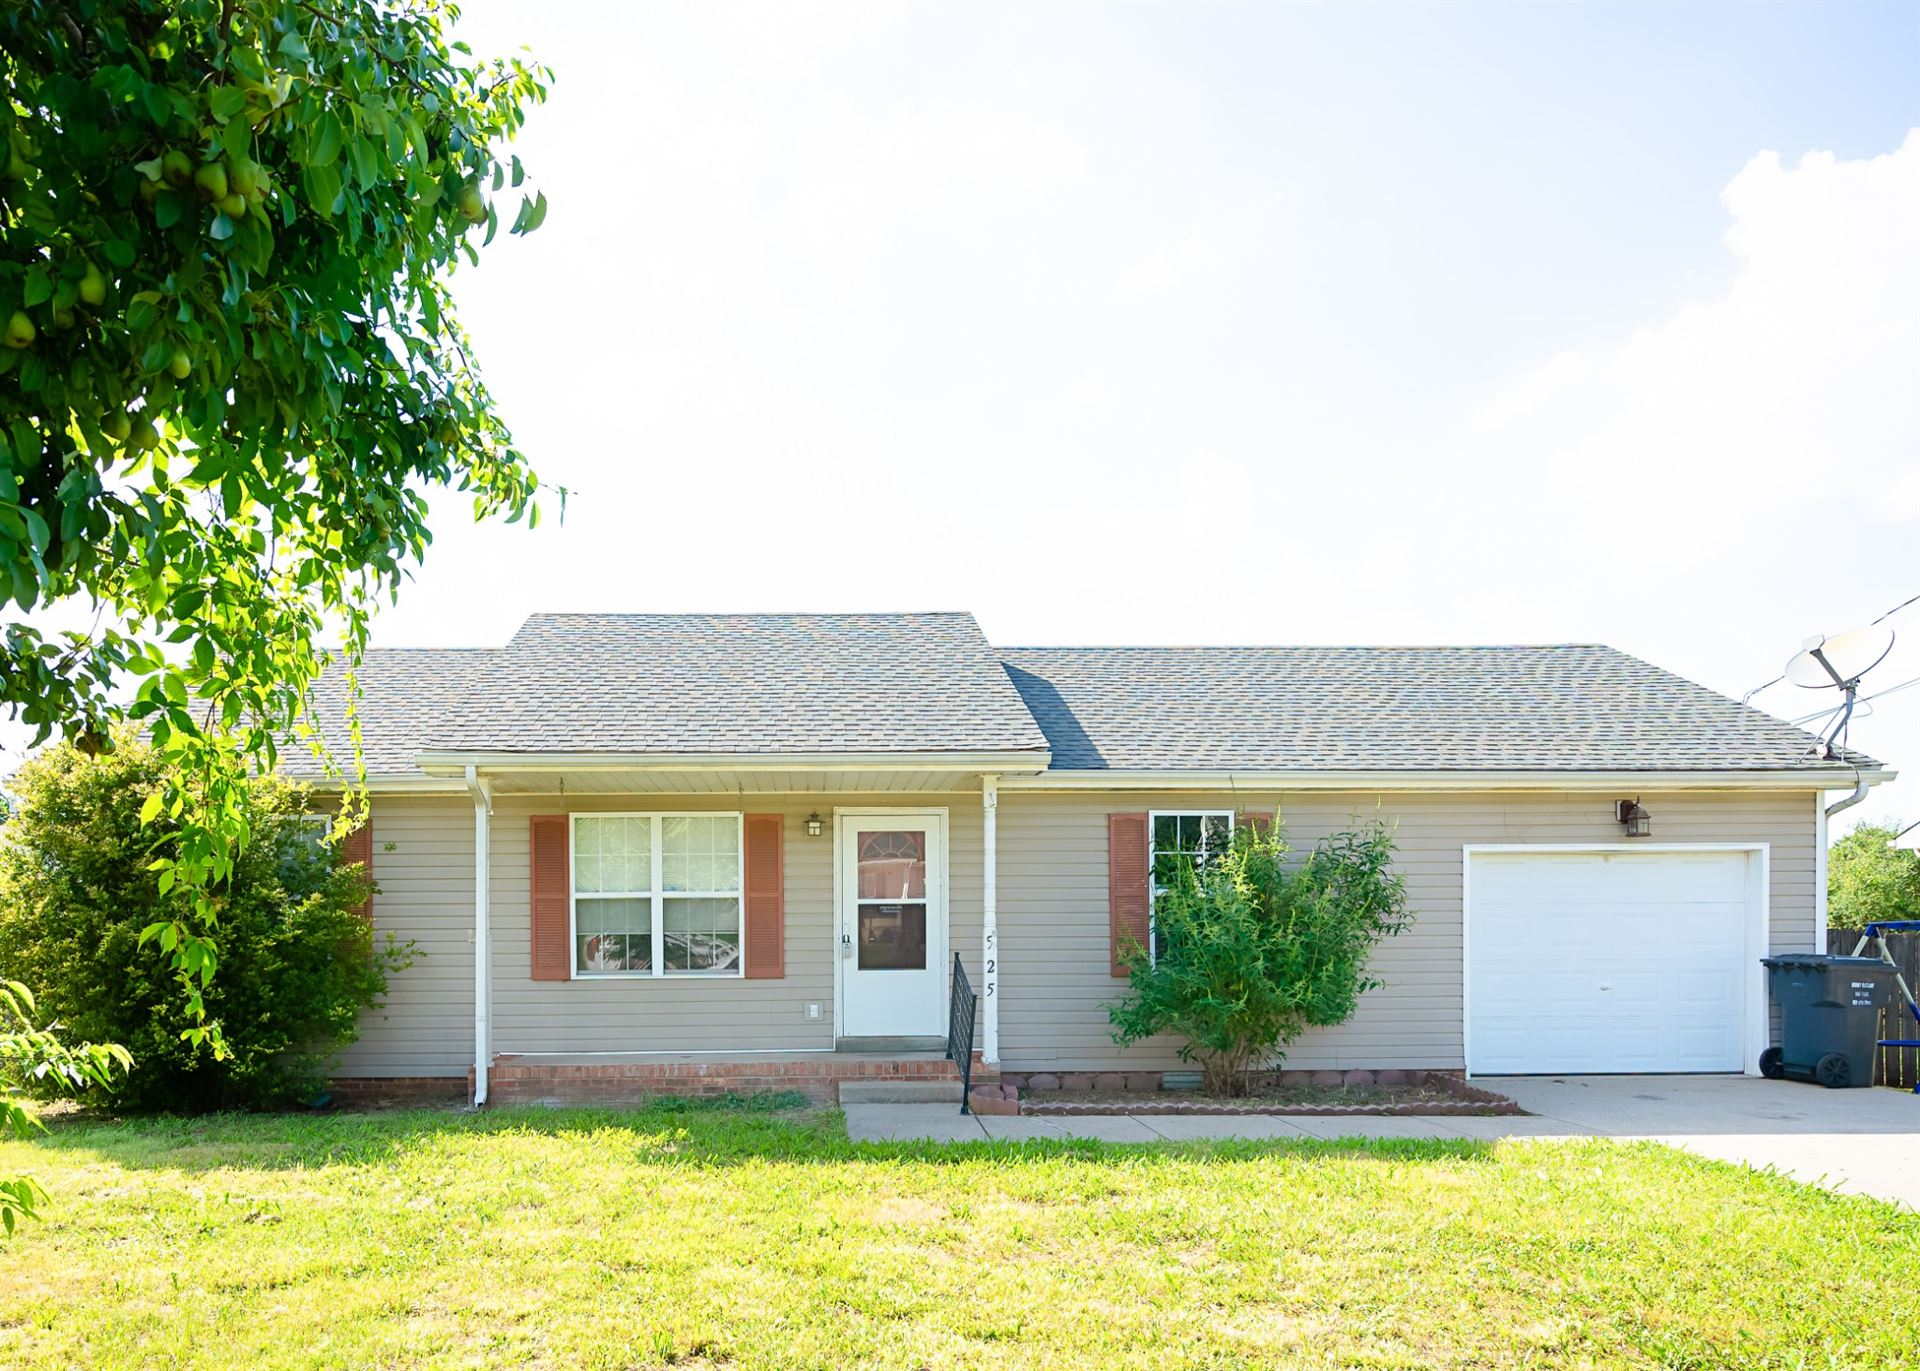 525 Indian Ave, Oak Grove, KY 42262 - MLS#: 2253231